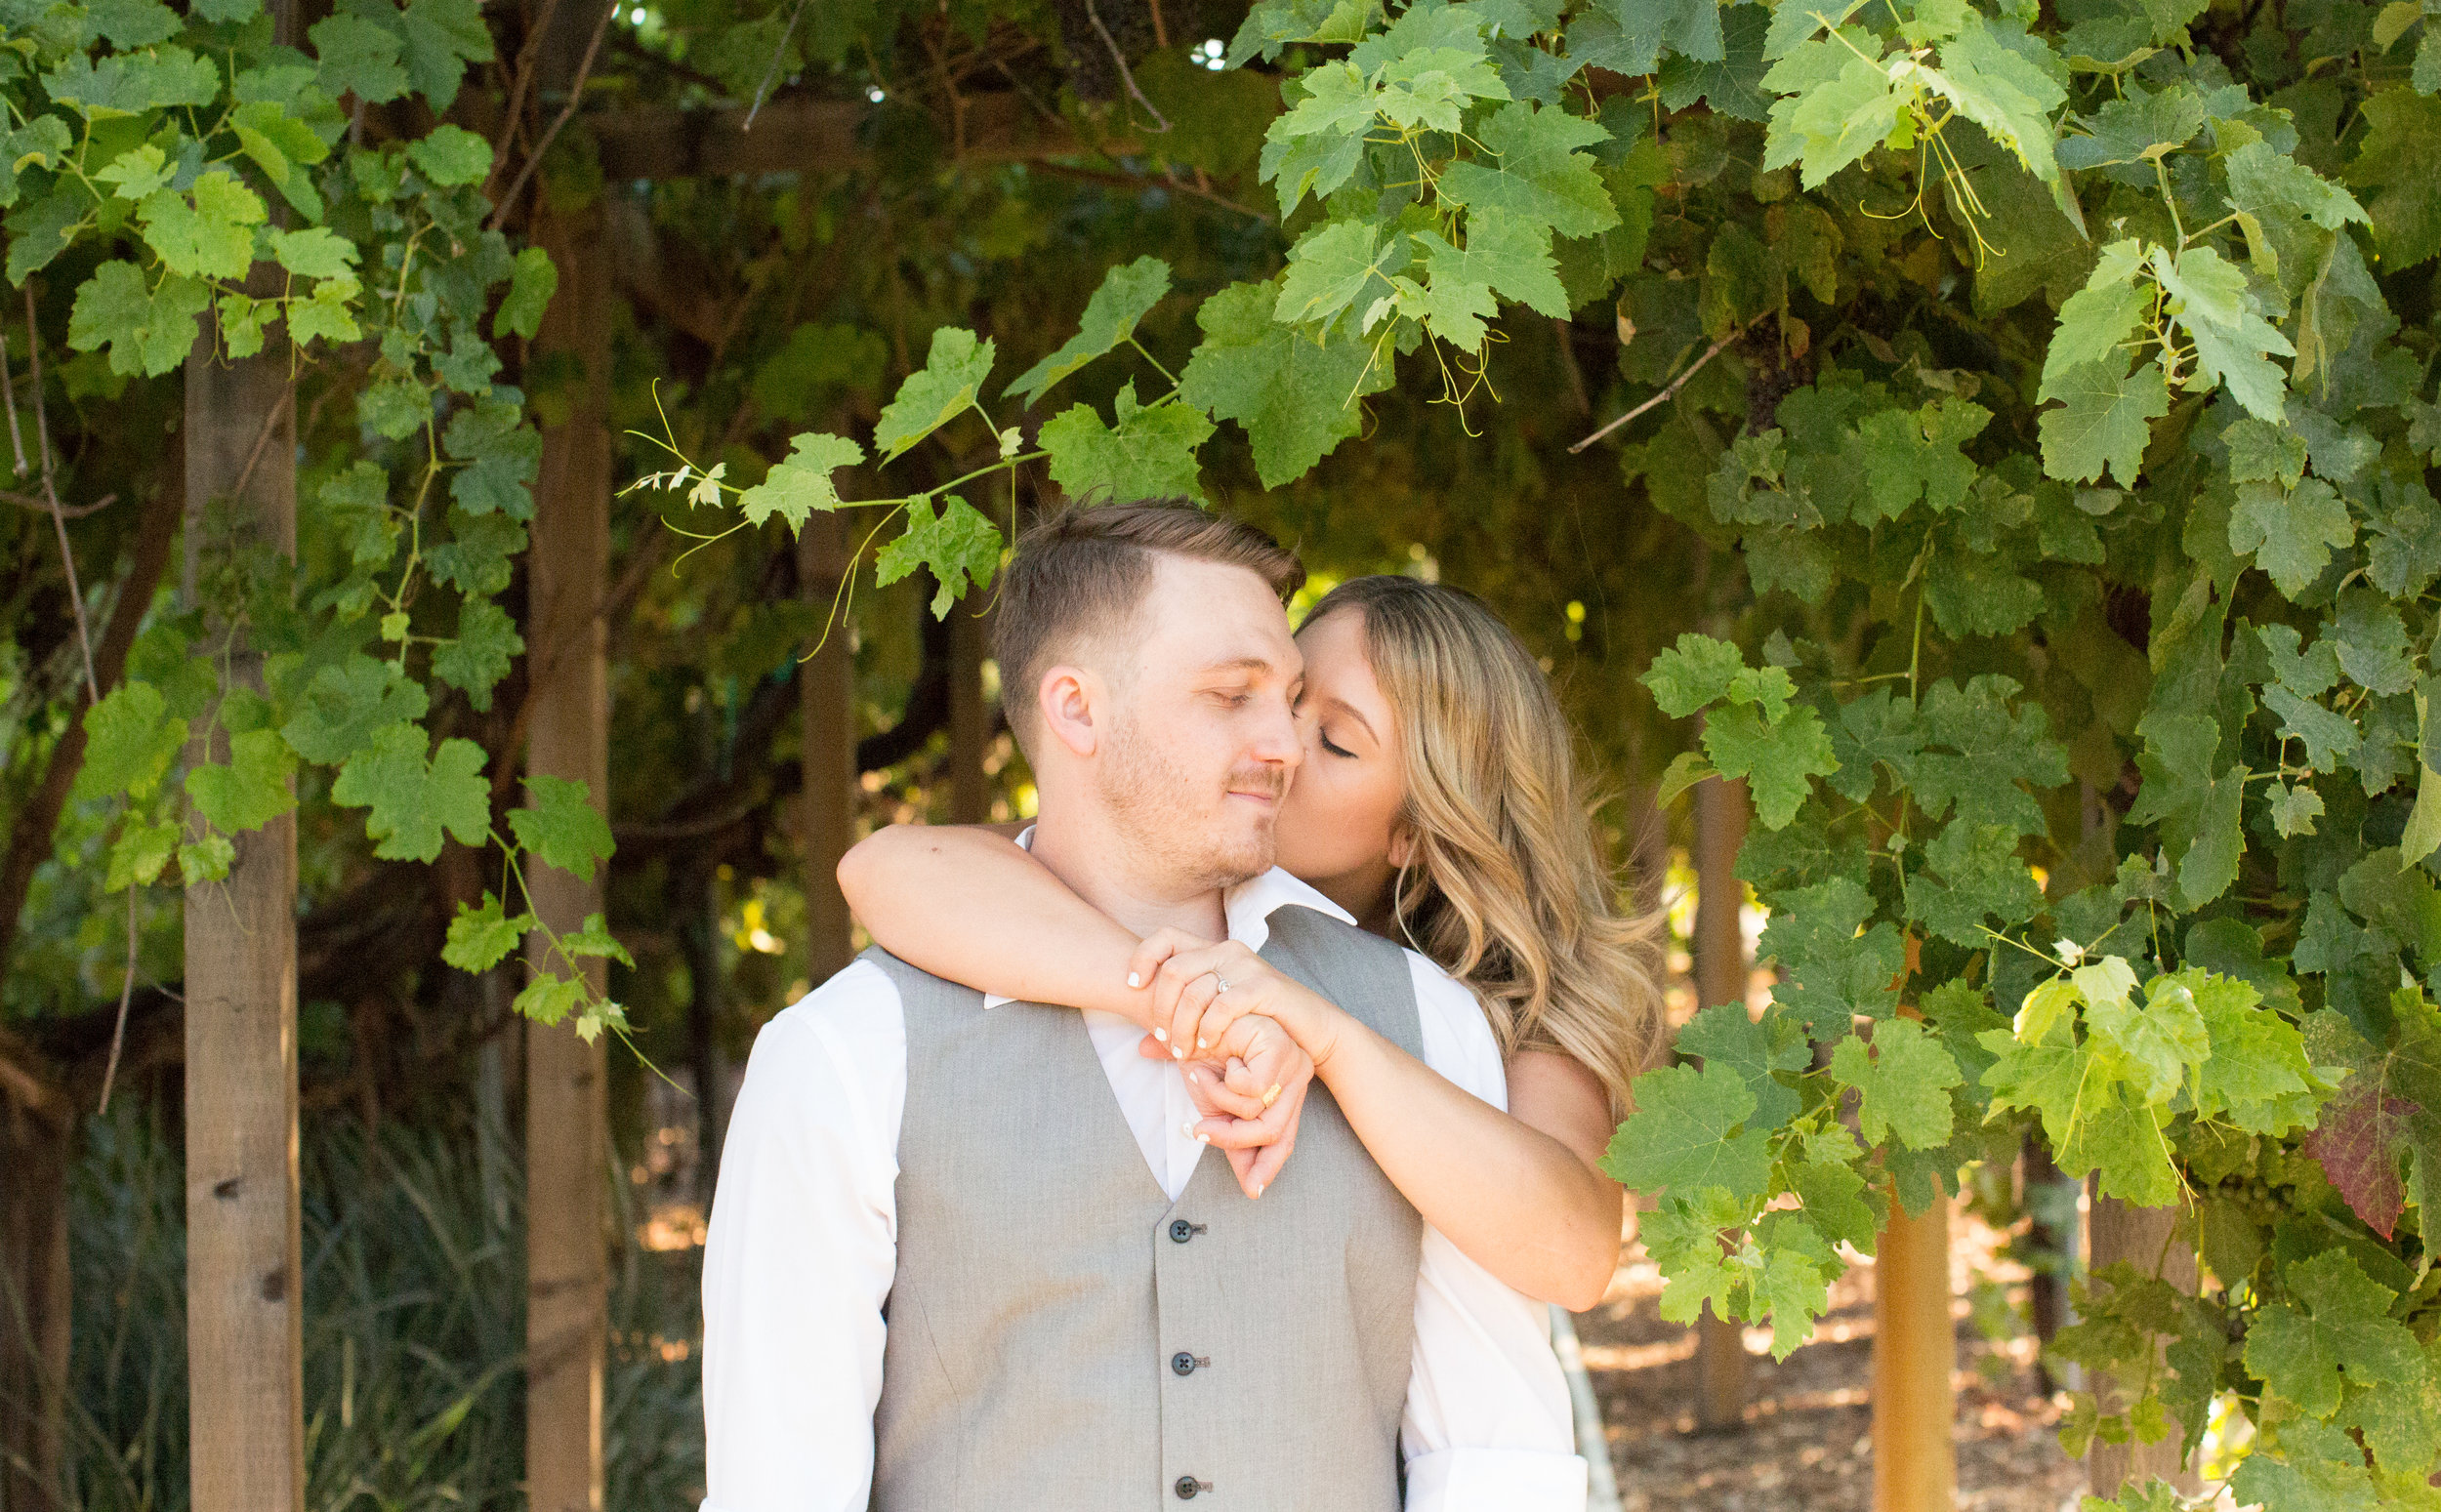 Jordan &Melissa Engagements - Higuera Ranch San Luis Obispo CA, August 8th, 2017